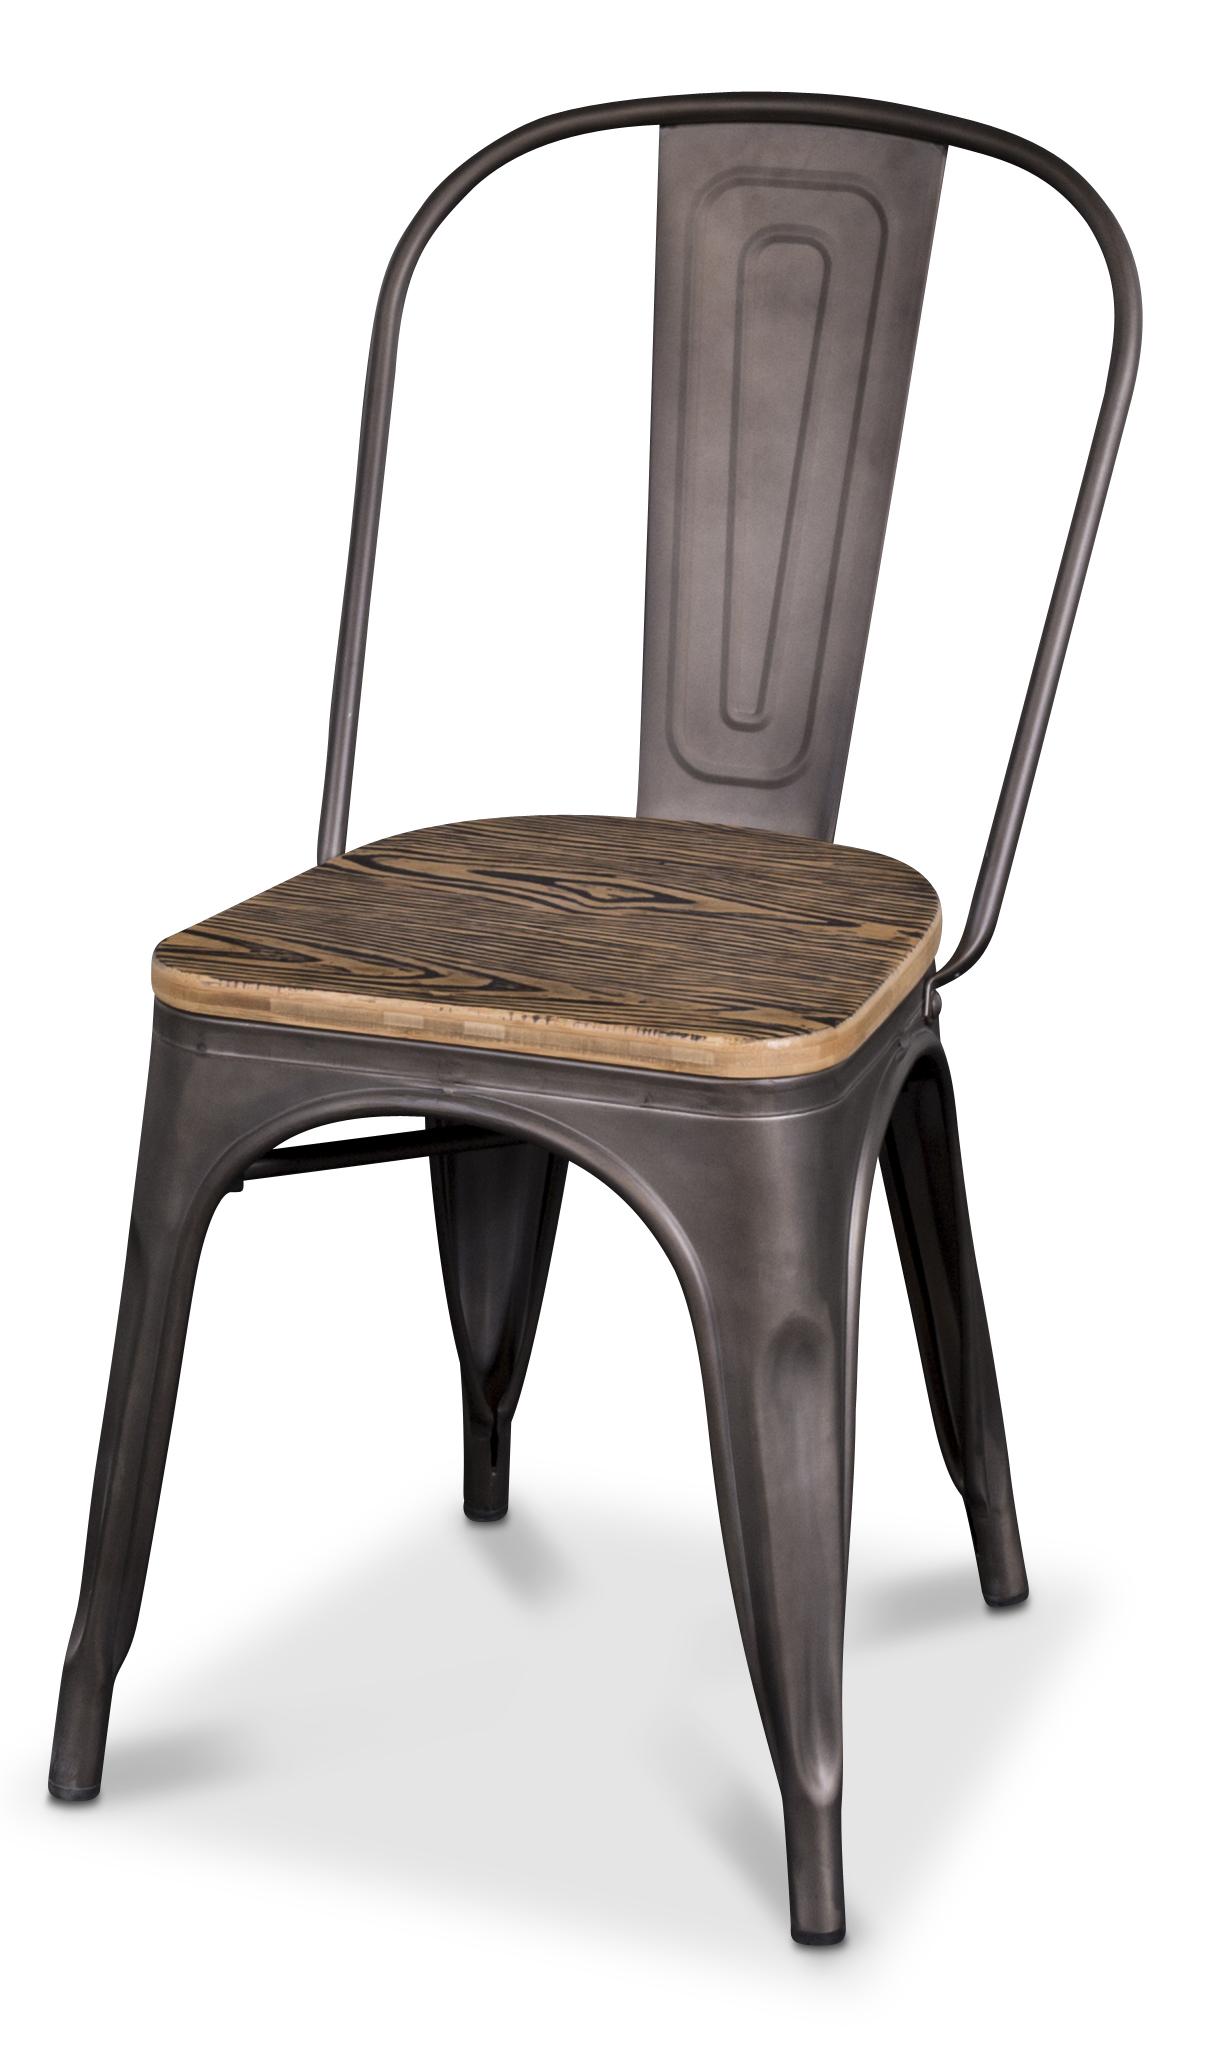 Stol industry - Plåt / trä